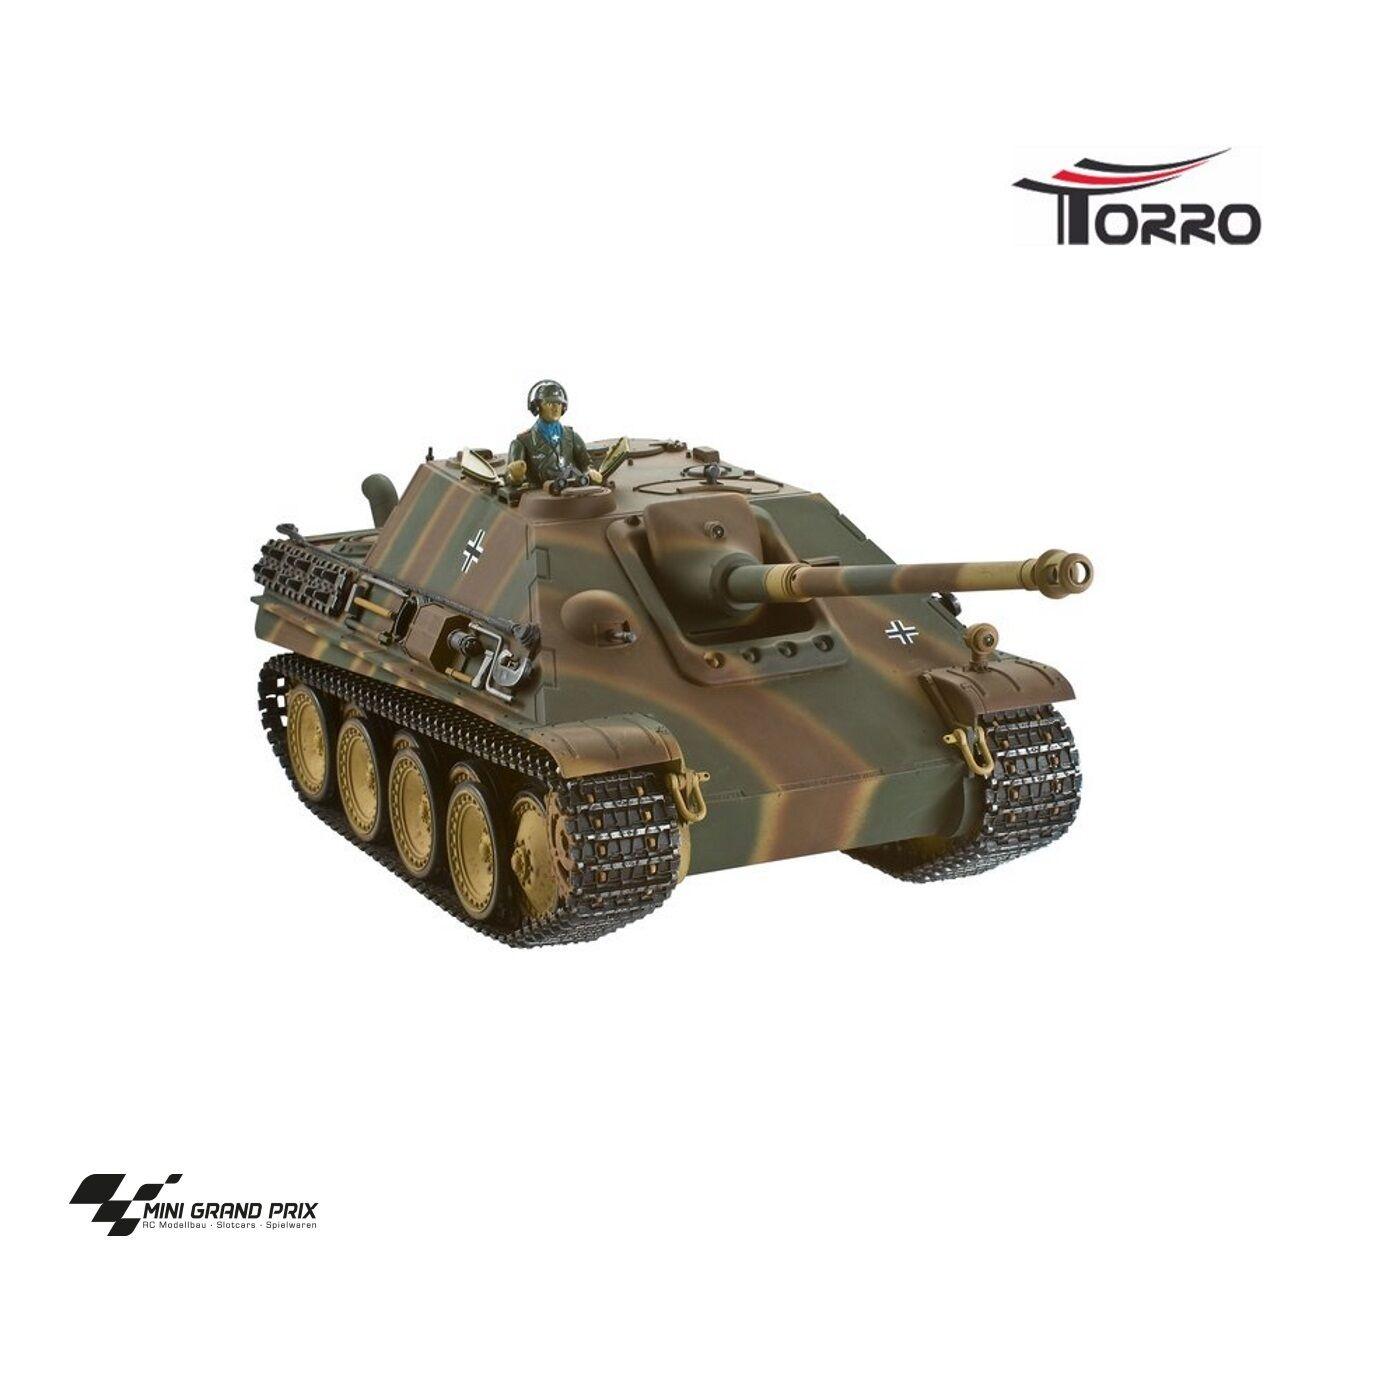 Torro 1:16 RC Jagdpanther professionale versione metallica BB CON SCATOLA